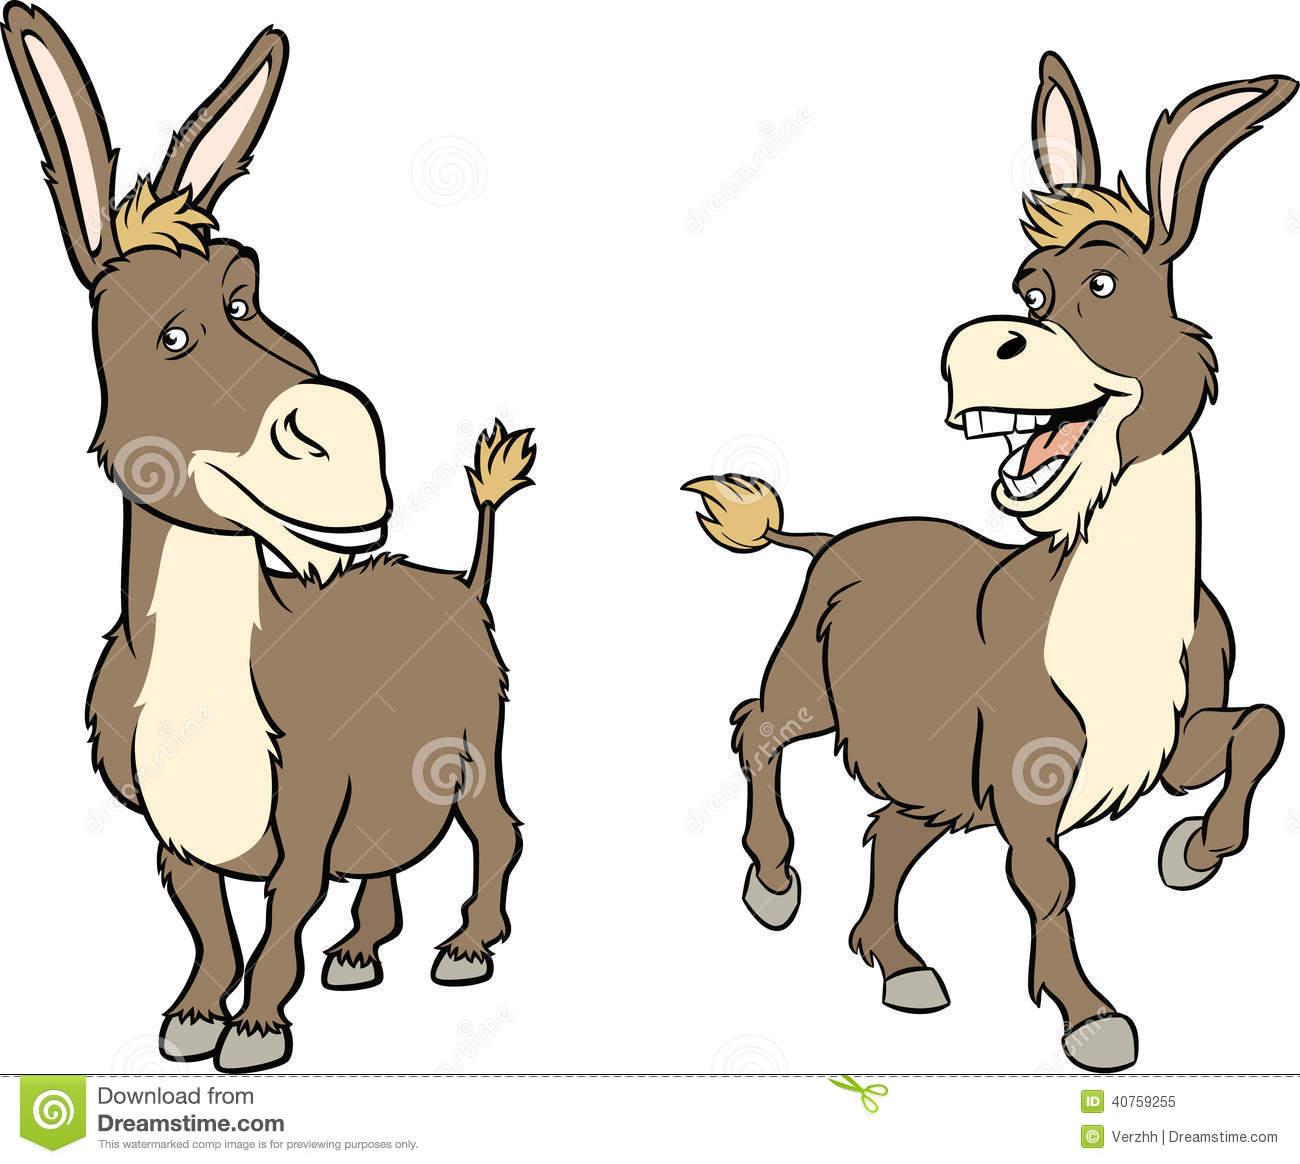 Donkey Graphic.